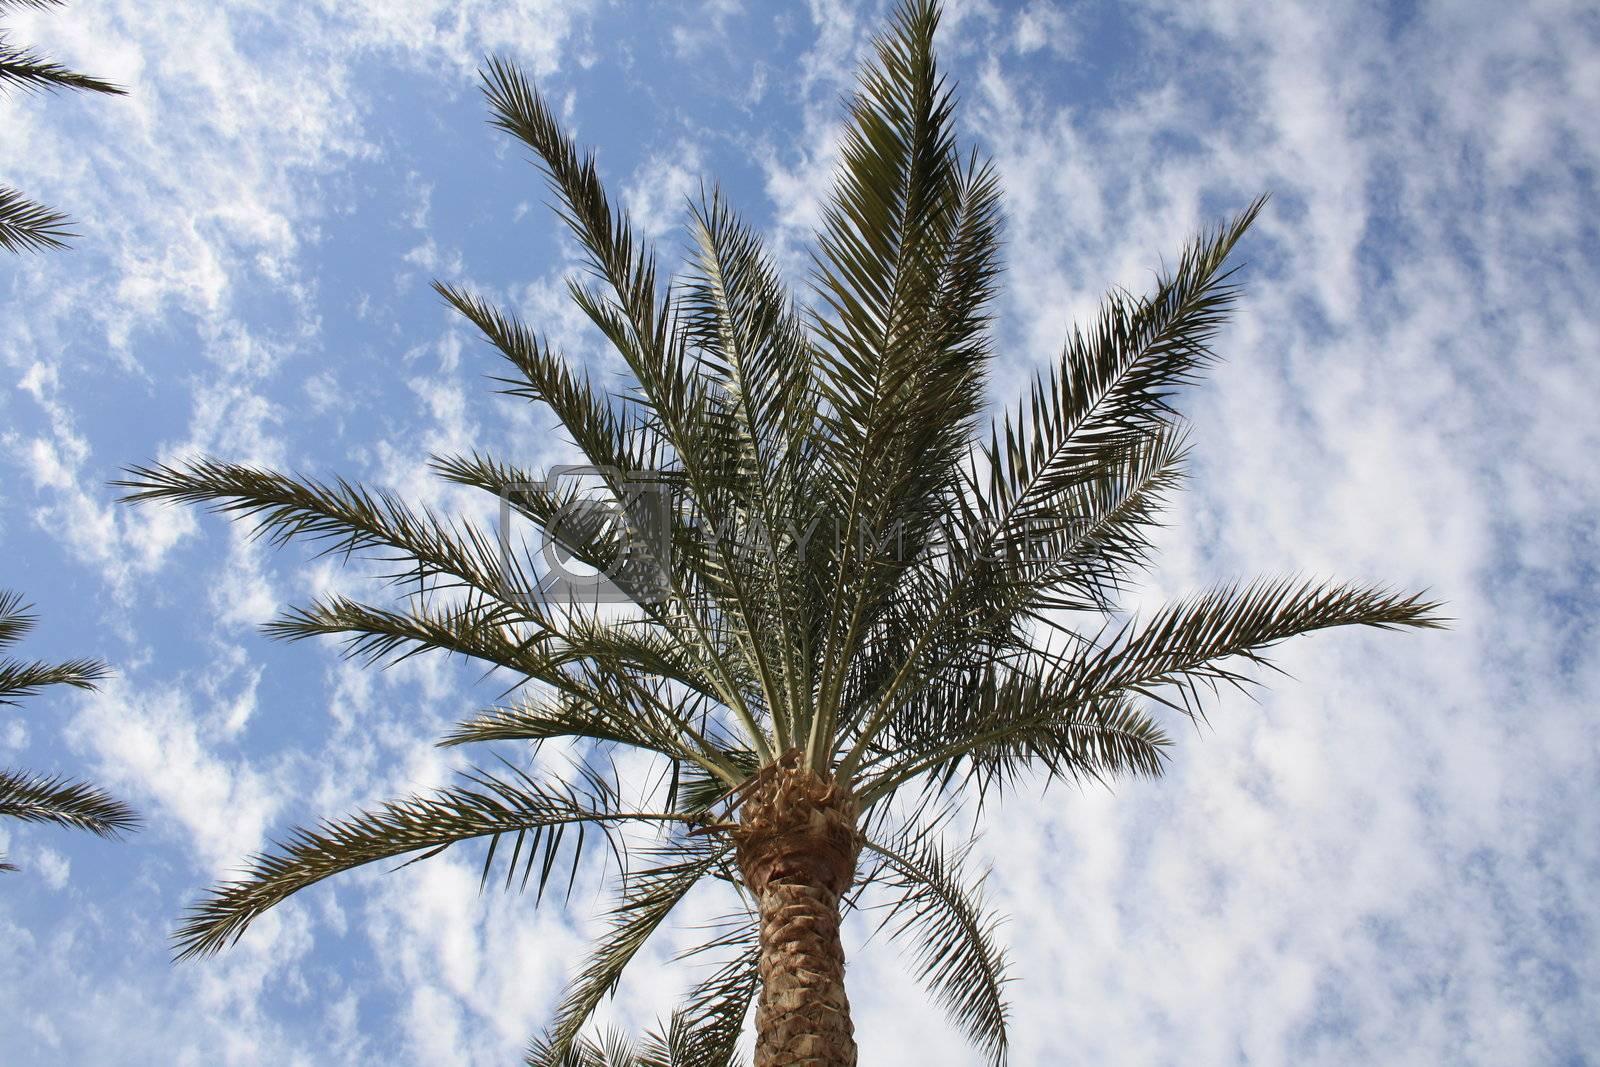 beautiful palm trees in the long seaside resort